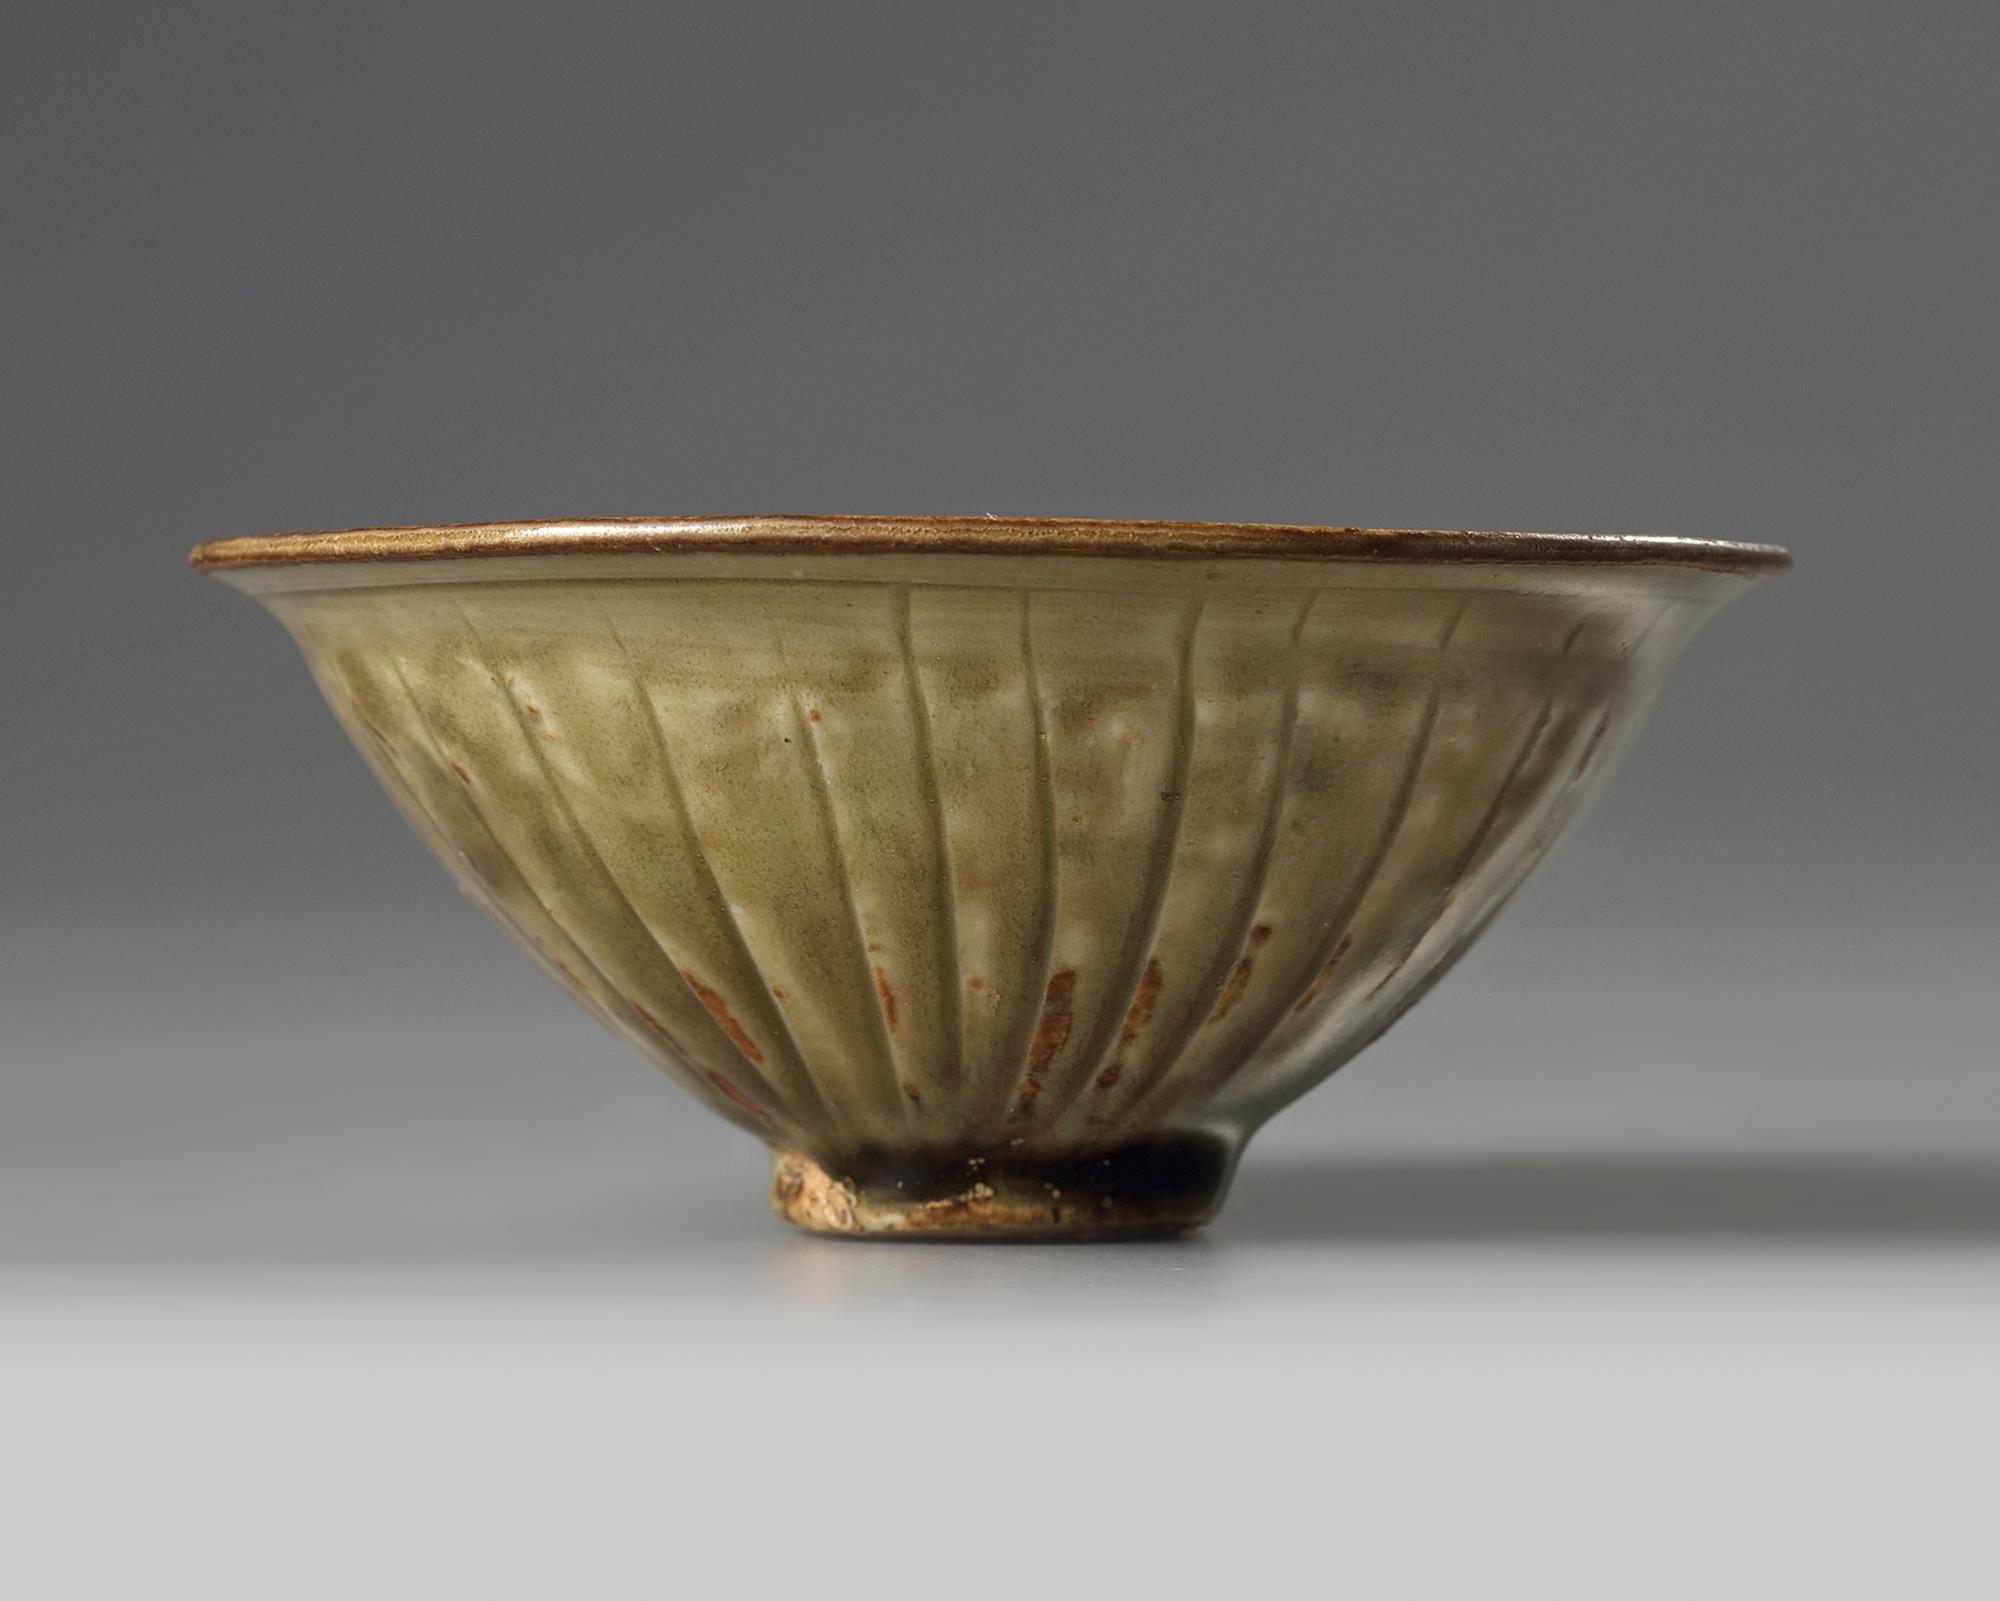 Lot 16 - A Yaozhou celadon-glazed 'chrysanthemum' bowl